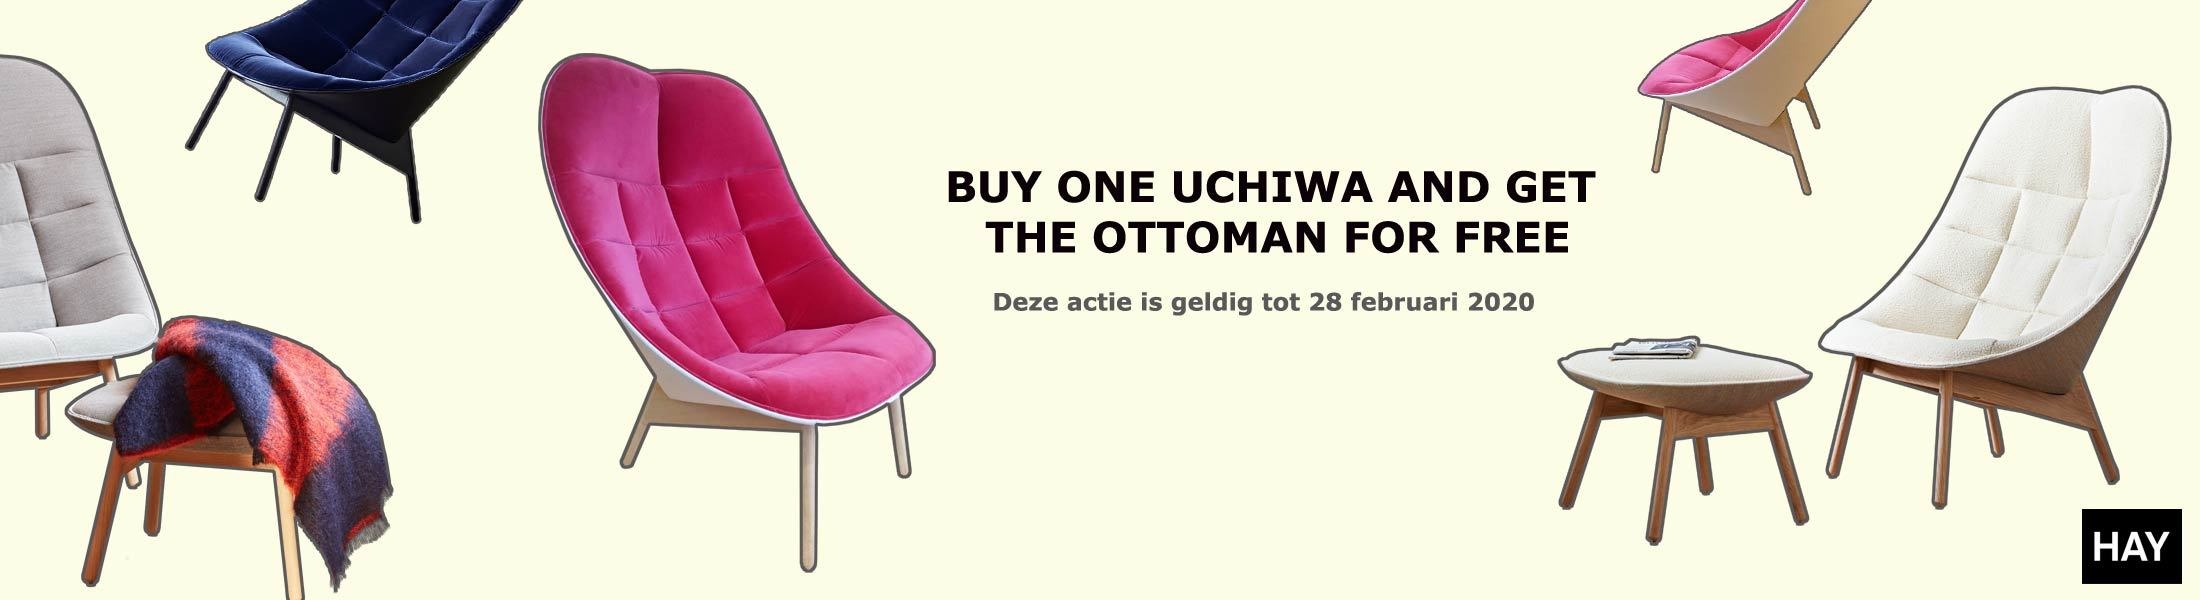 Uchiwa HAY aanbieding gratis ottoman